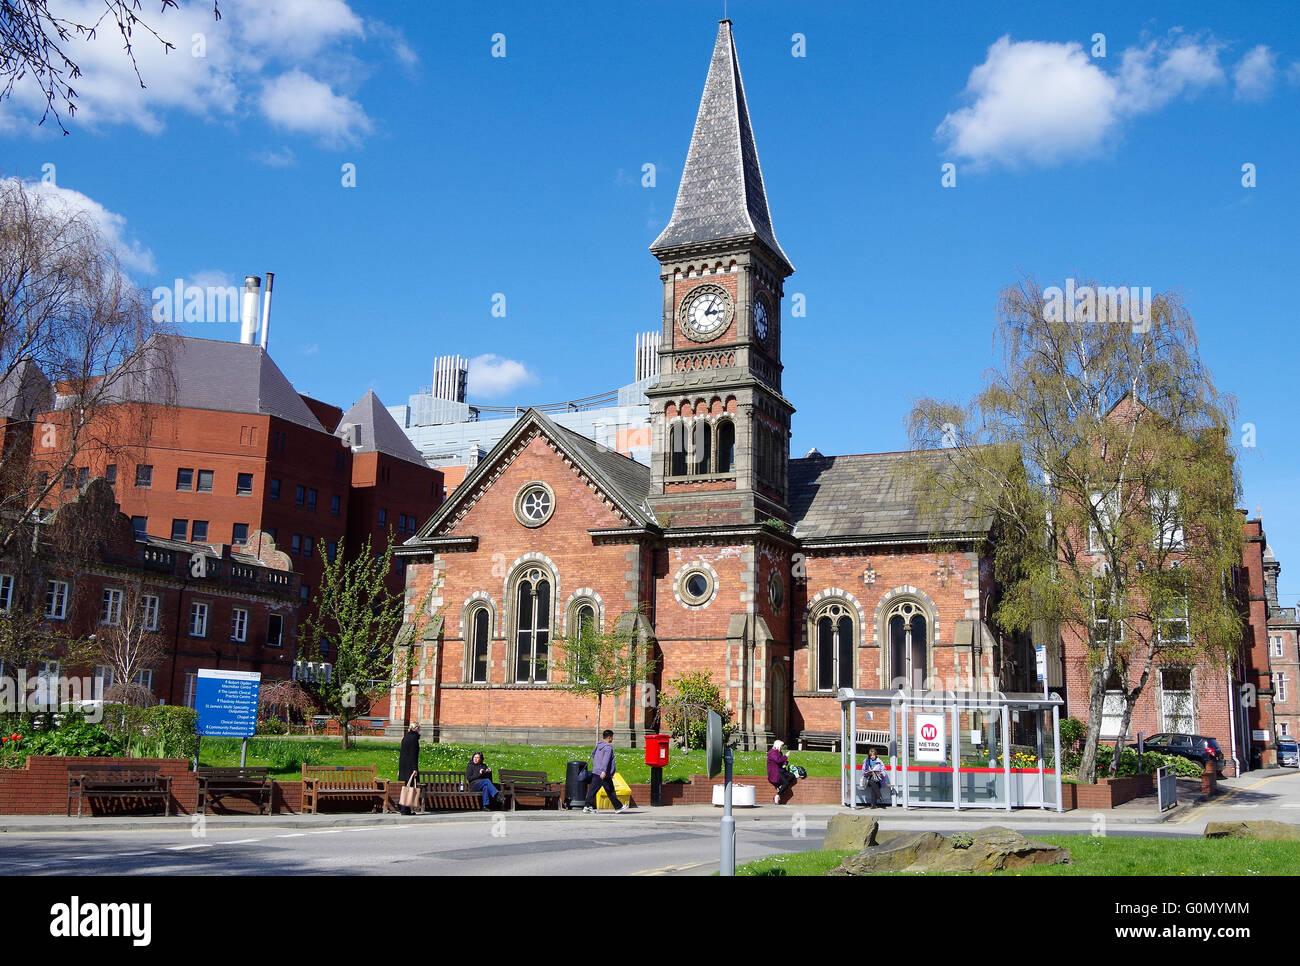 St James's Hospital, Leeds, the Chapel - Stock Image